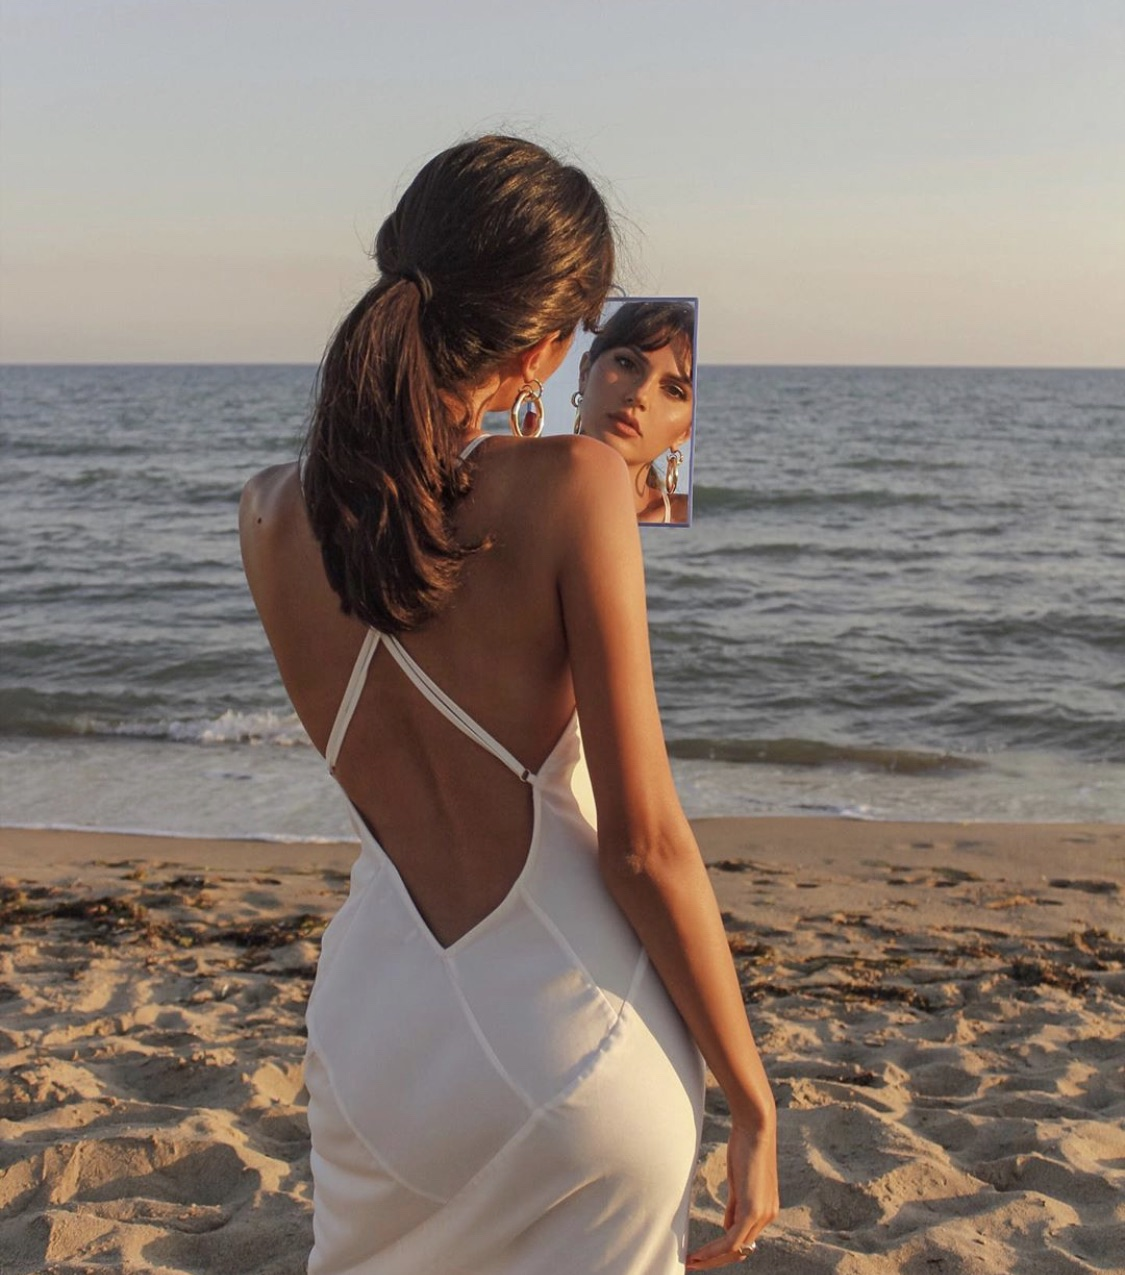 fashion, mirror, and beach image